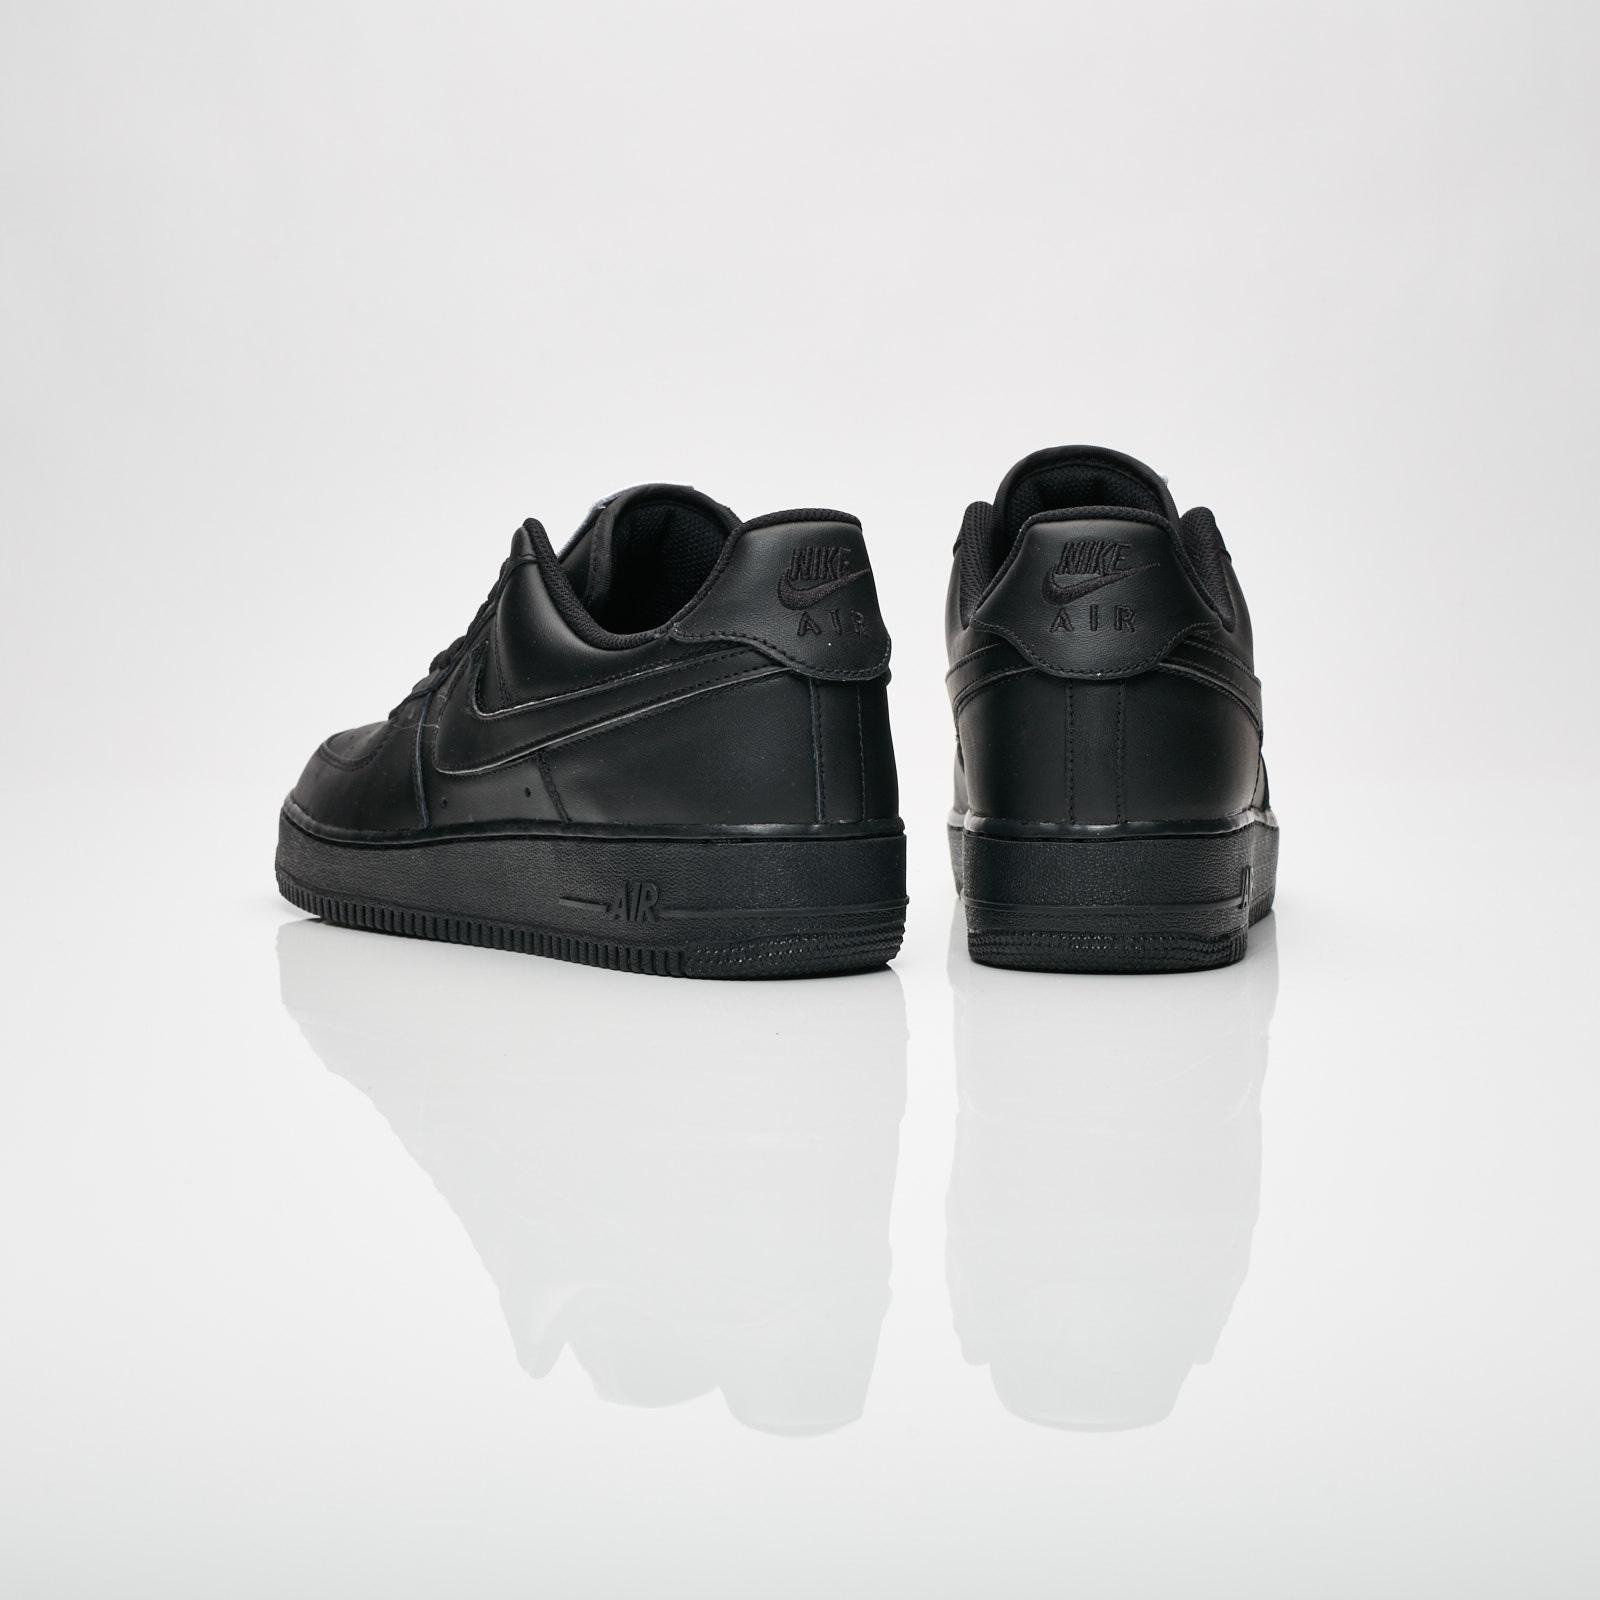 Nike Air Force 1 07 QS - Ah8462-002 - Sneakersnstuff  b8fea8938